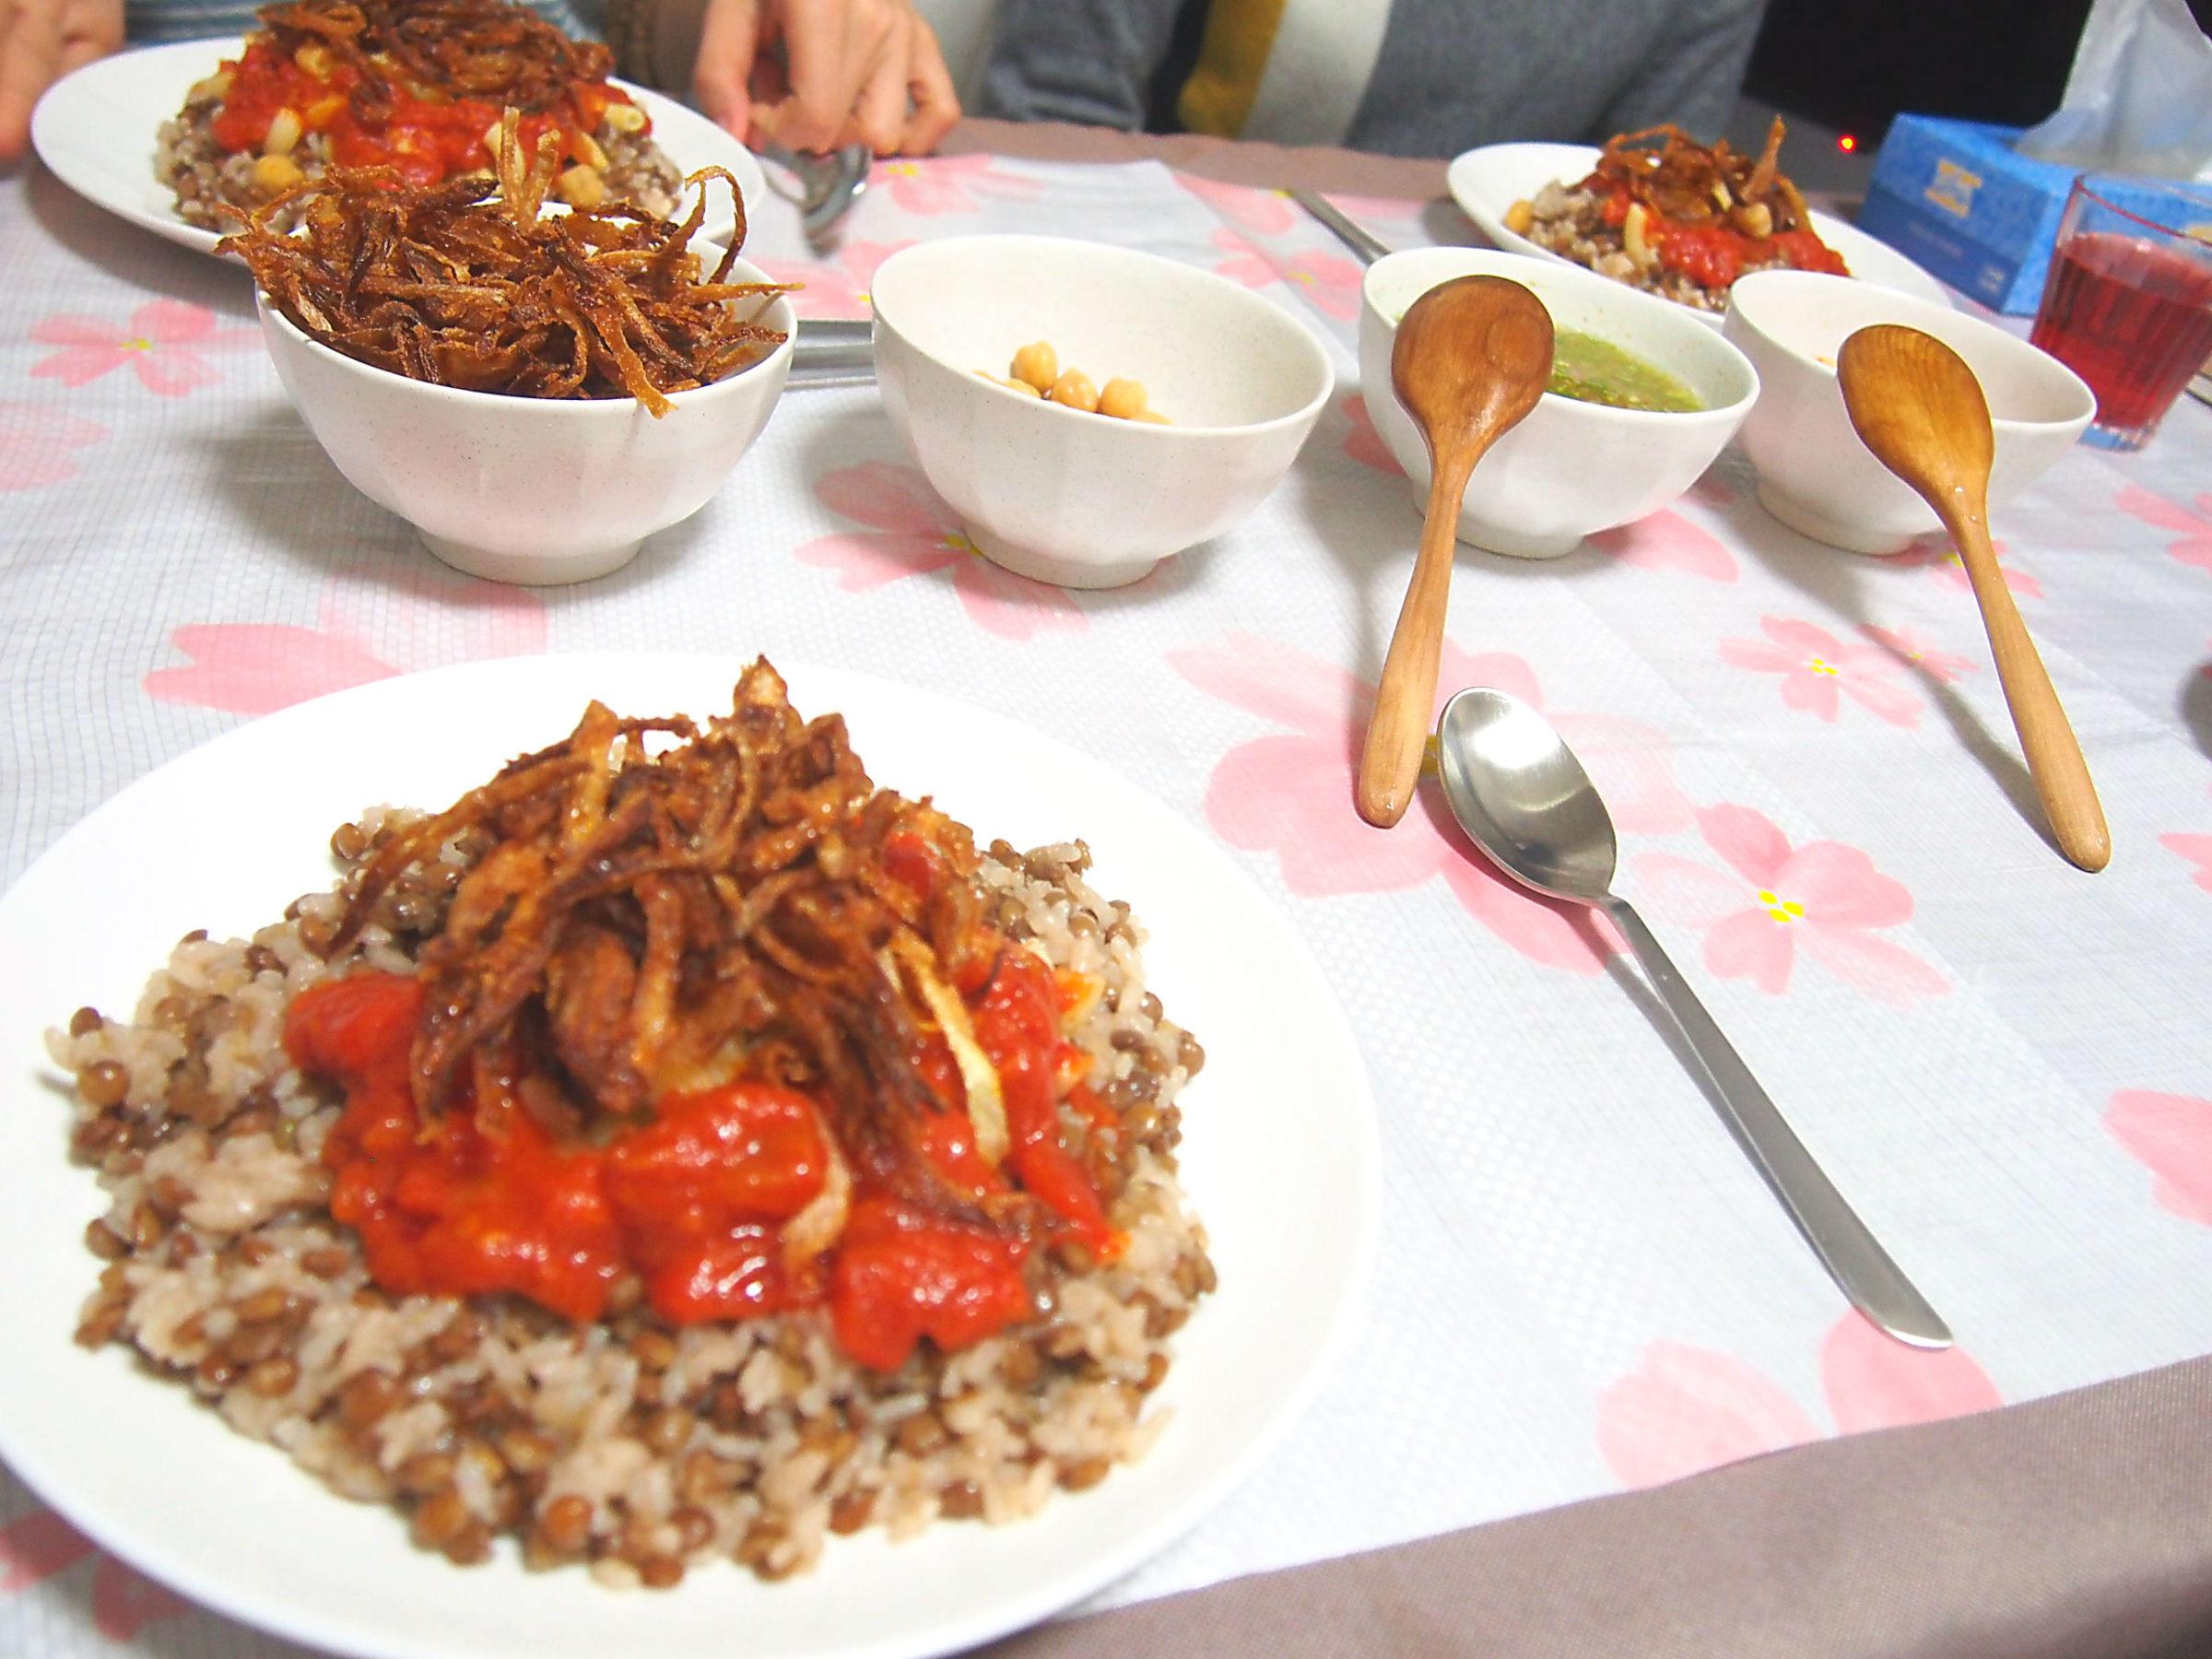 Tadakuに参加した感想!料理も英語も勉強になりました!